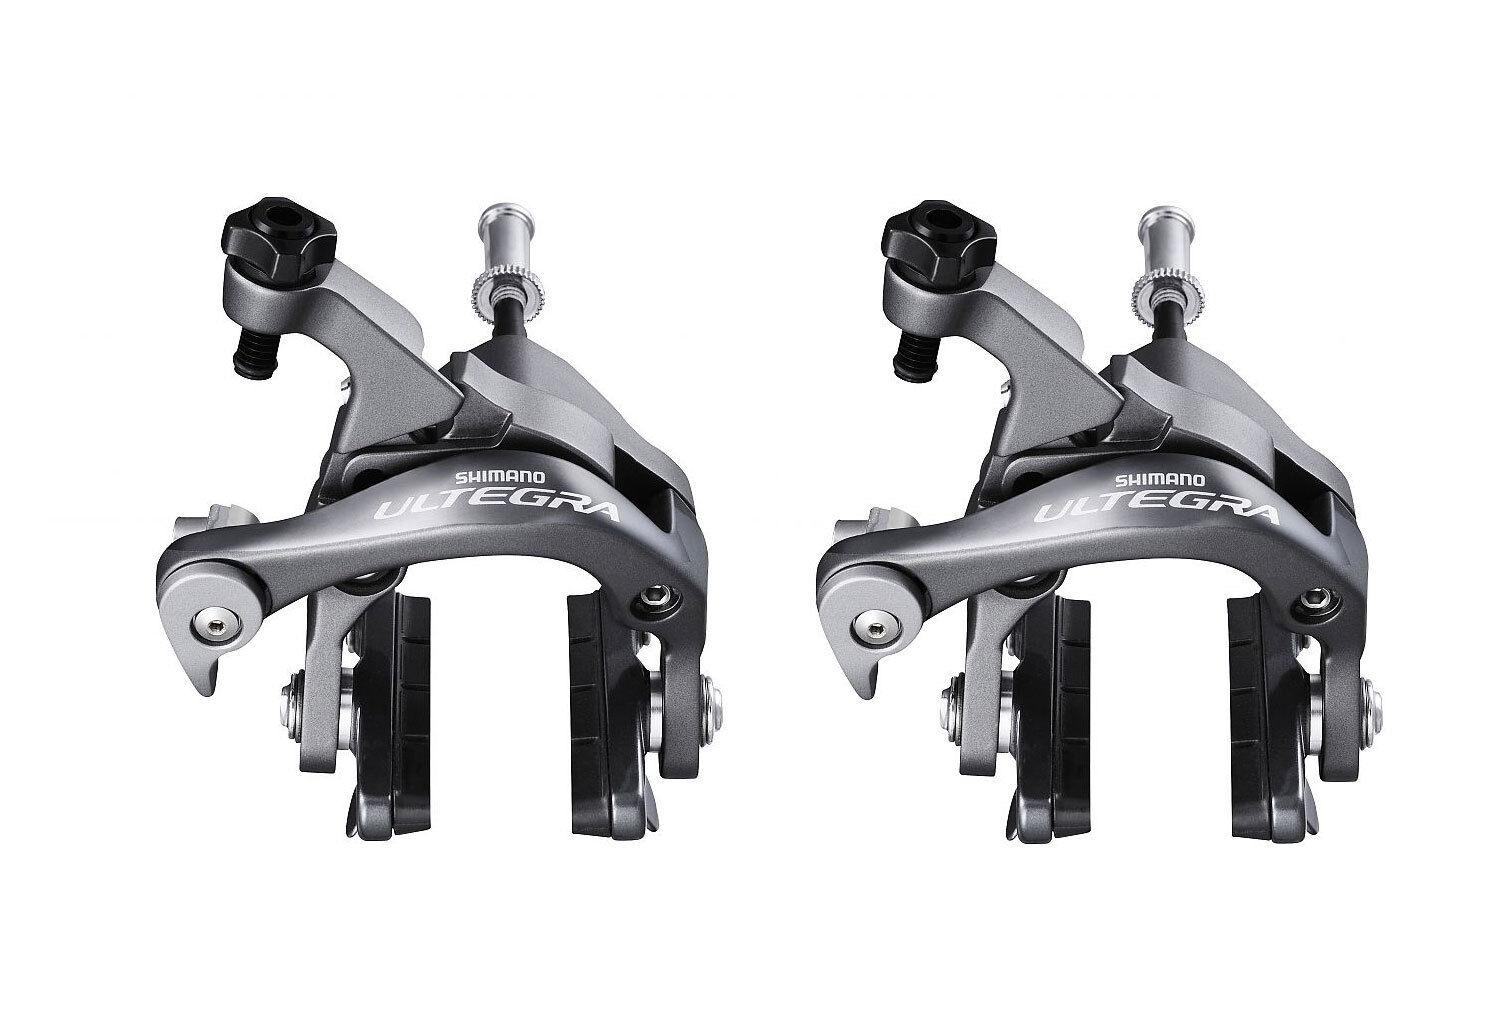 Shimano Ultegra 6800 - Dual Pivot Road Bike Brake Calipers